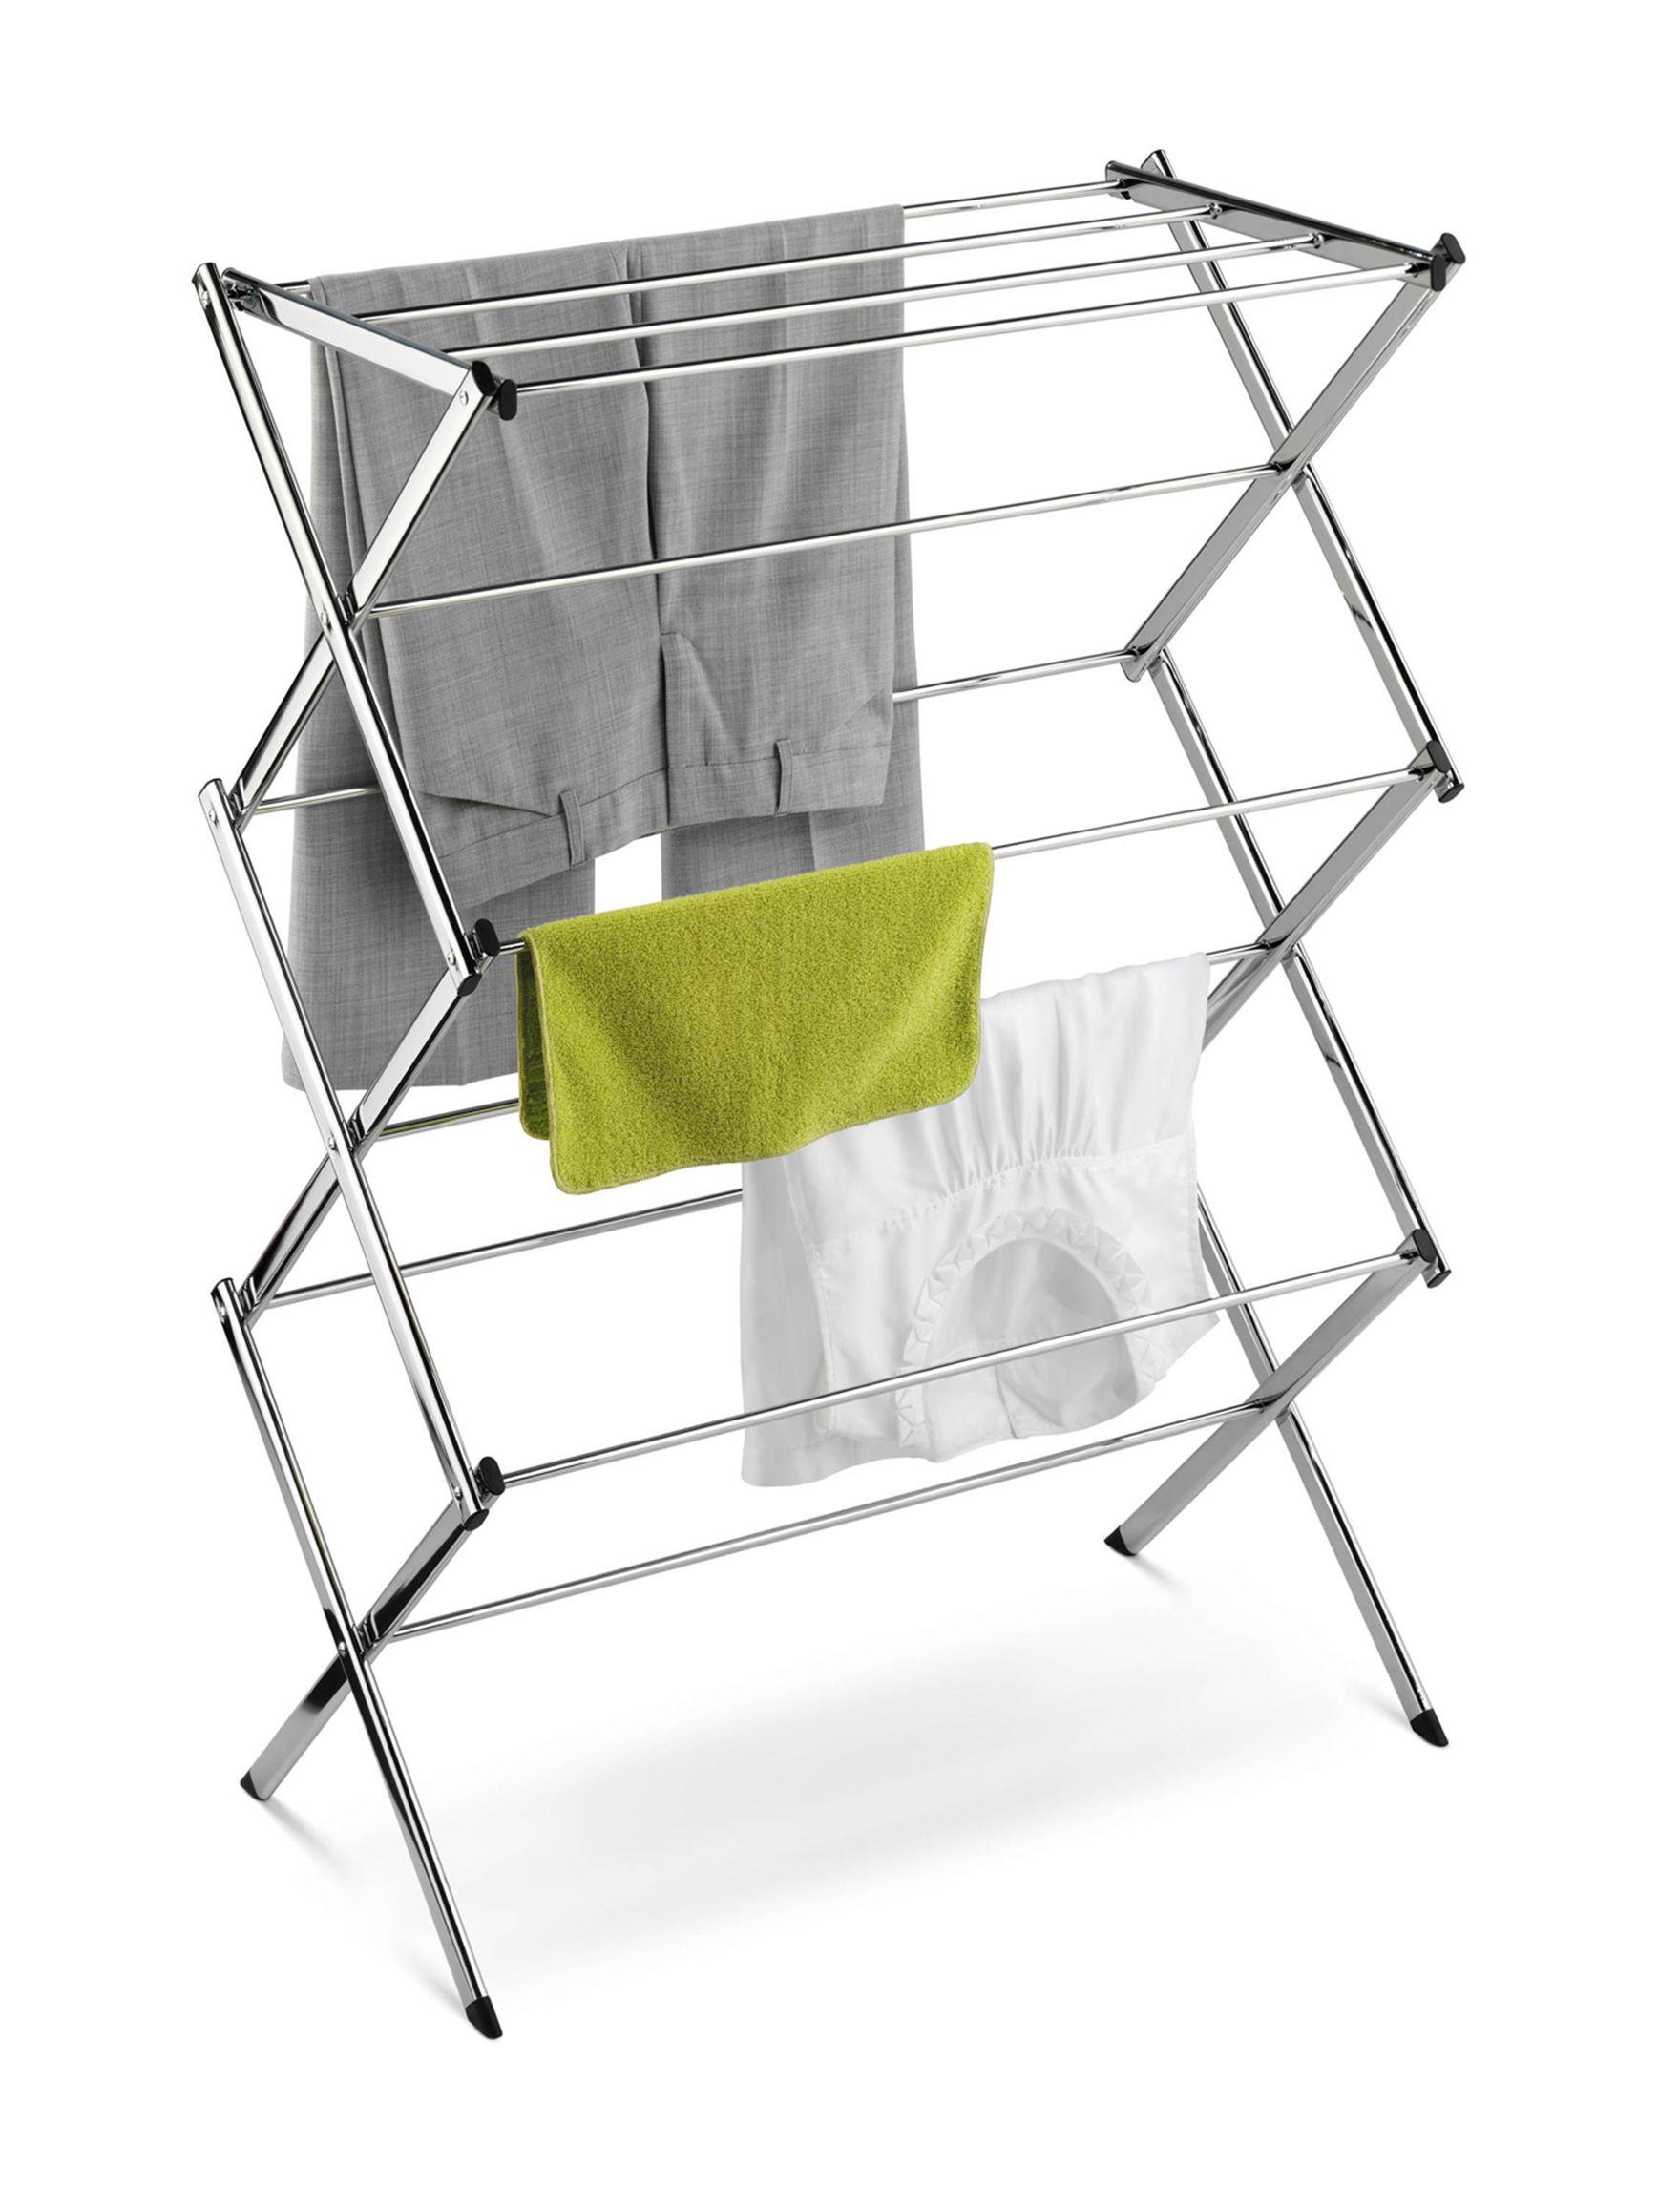 Honey-Can-Do International Silver Garment & Drying Racks